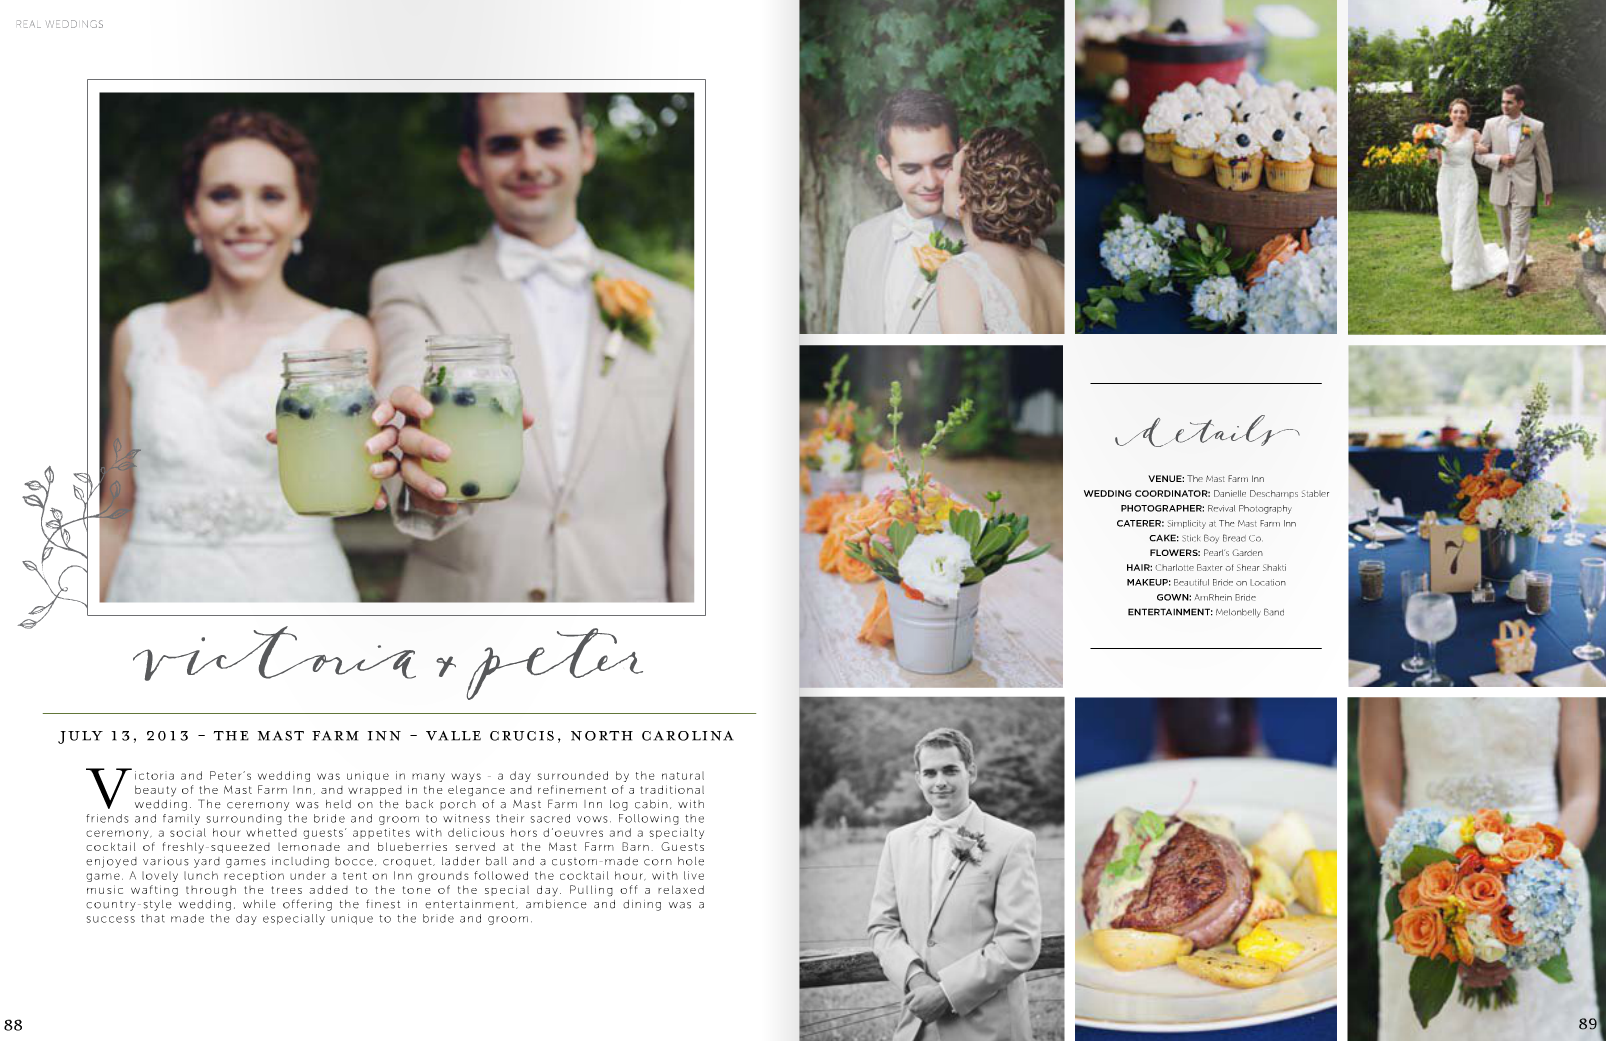 A Mast Farm Inn Wedding Featured in the High Country Wedding Guide